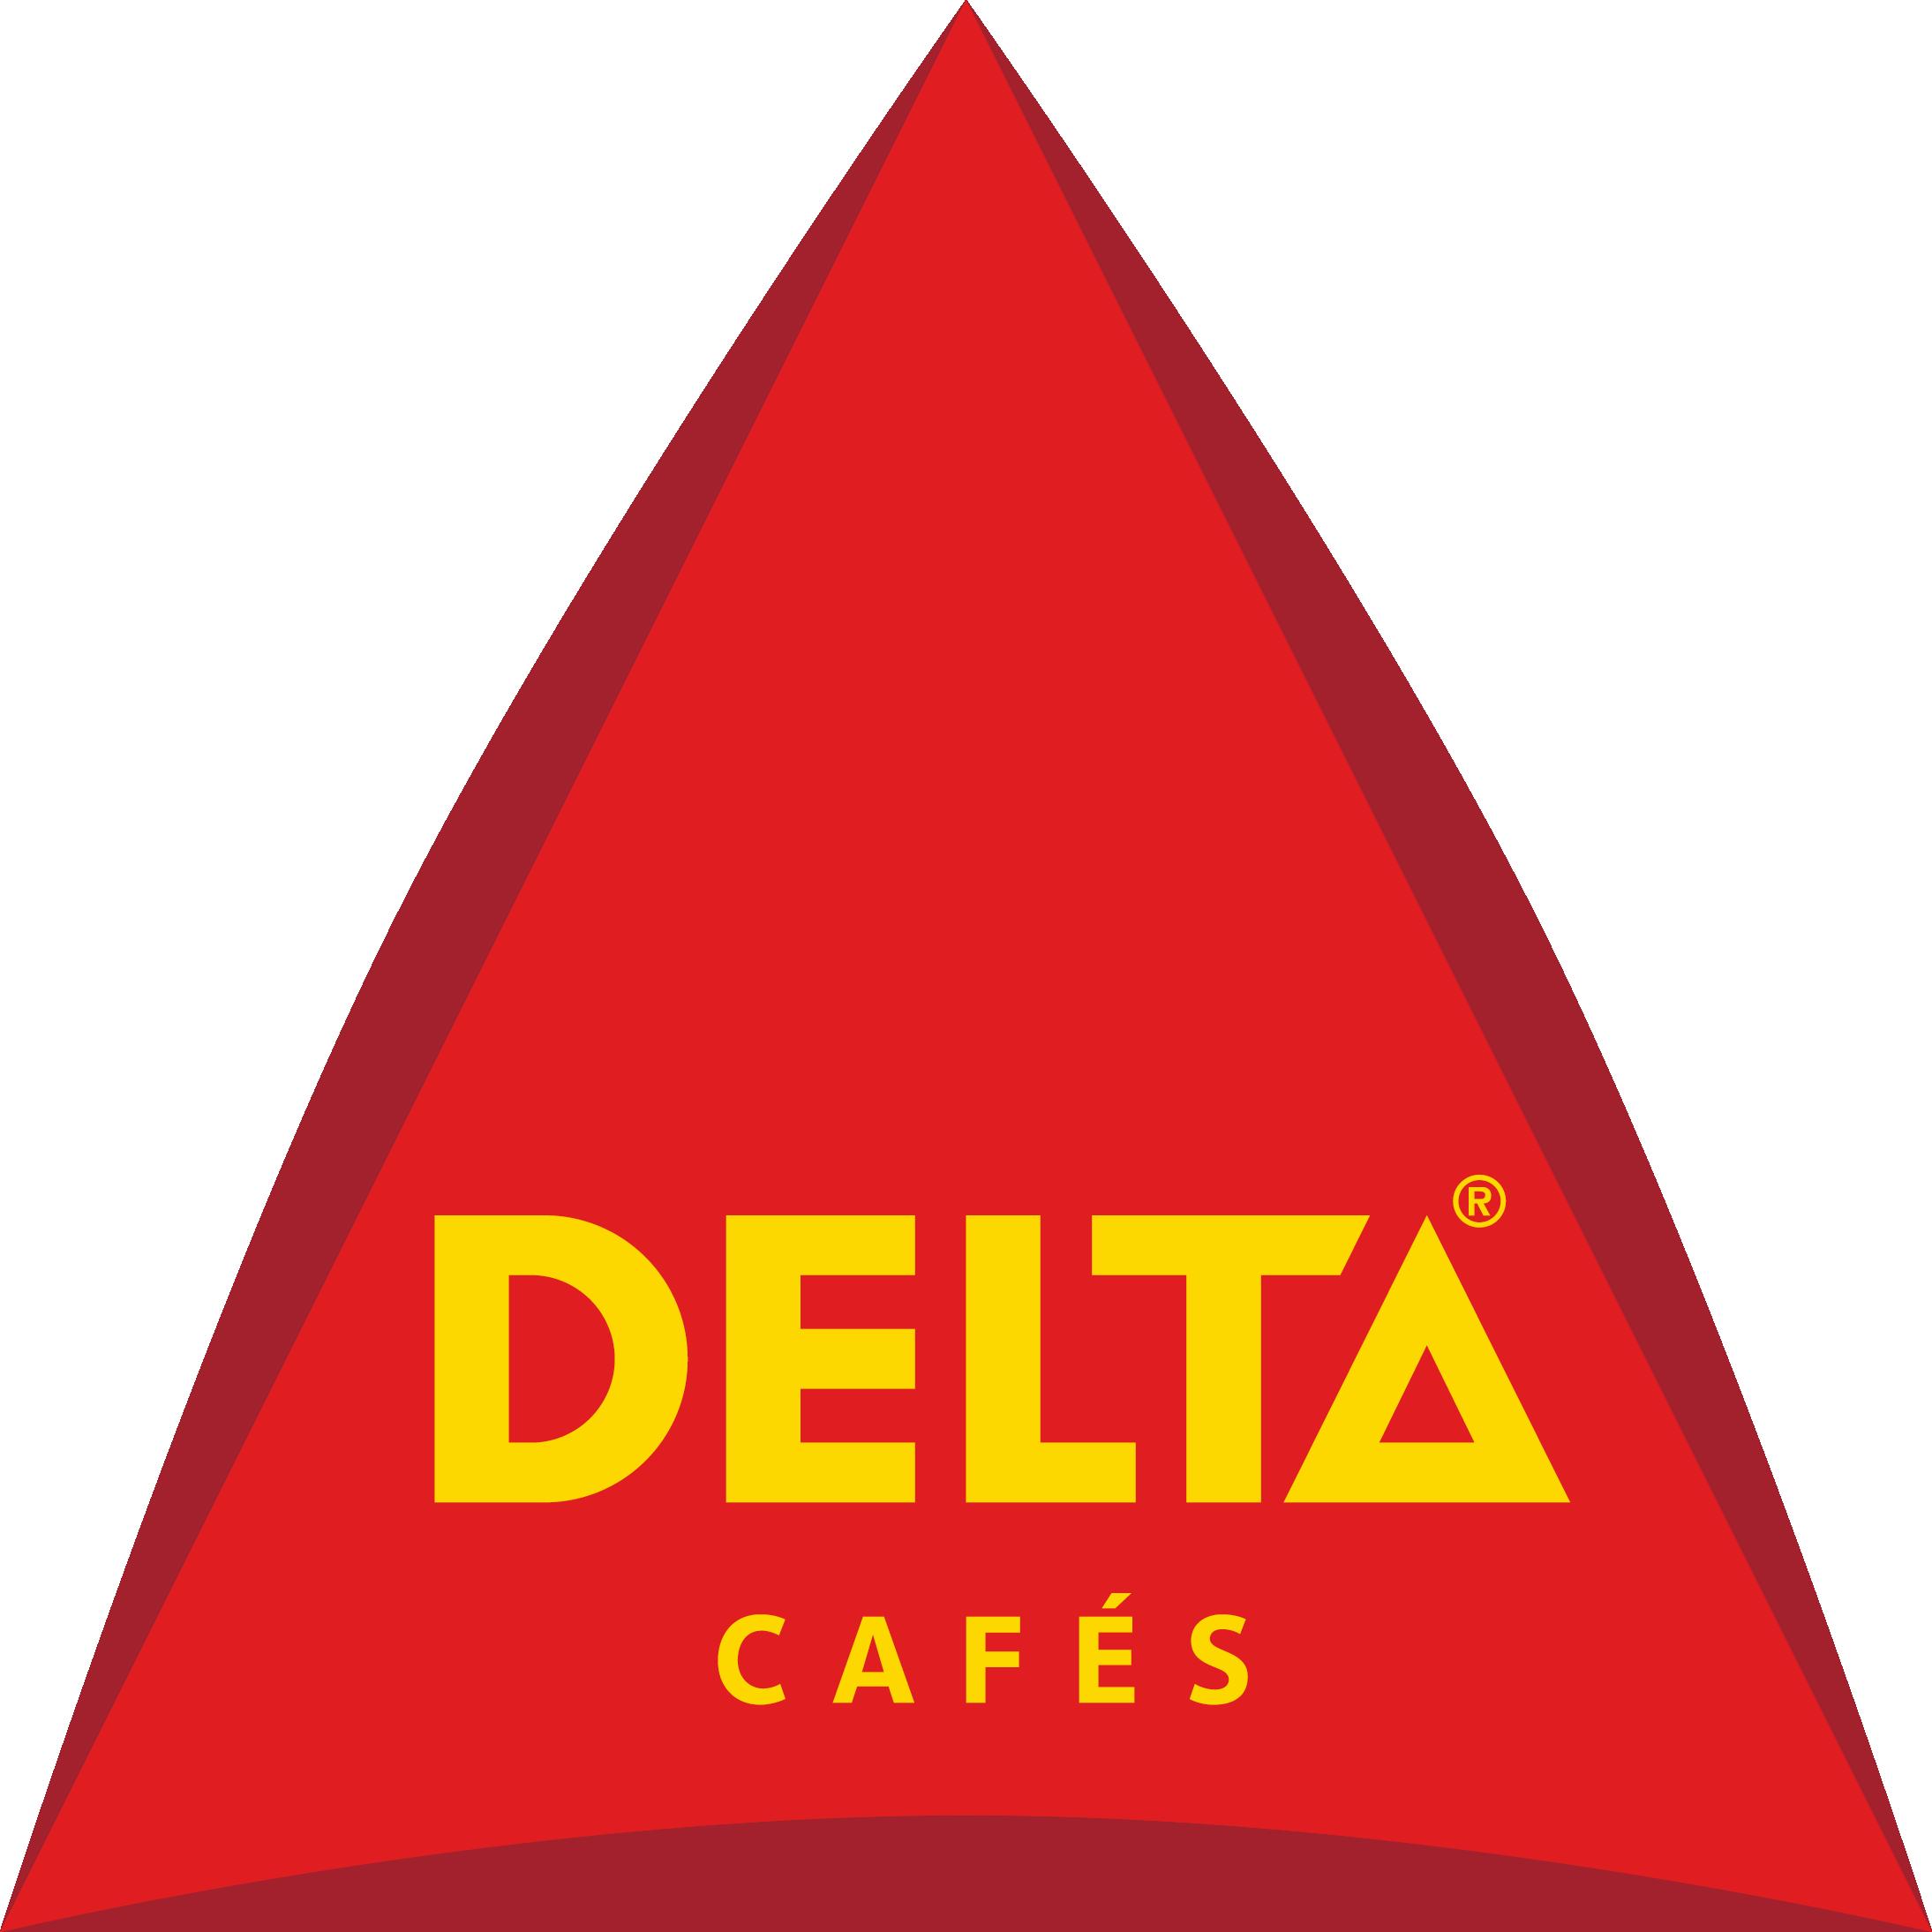 https://europeanplasticspact.org/wp-content/uploads/2021/05/delta-cafes_logo.png